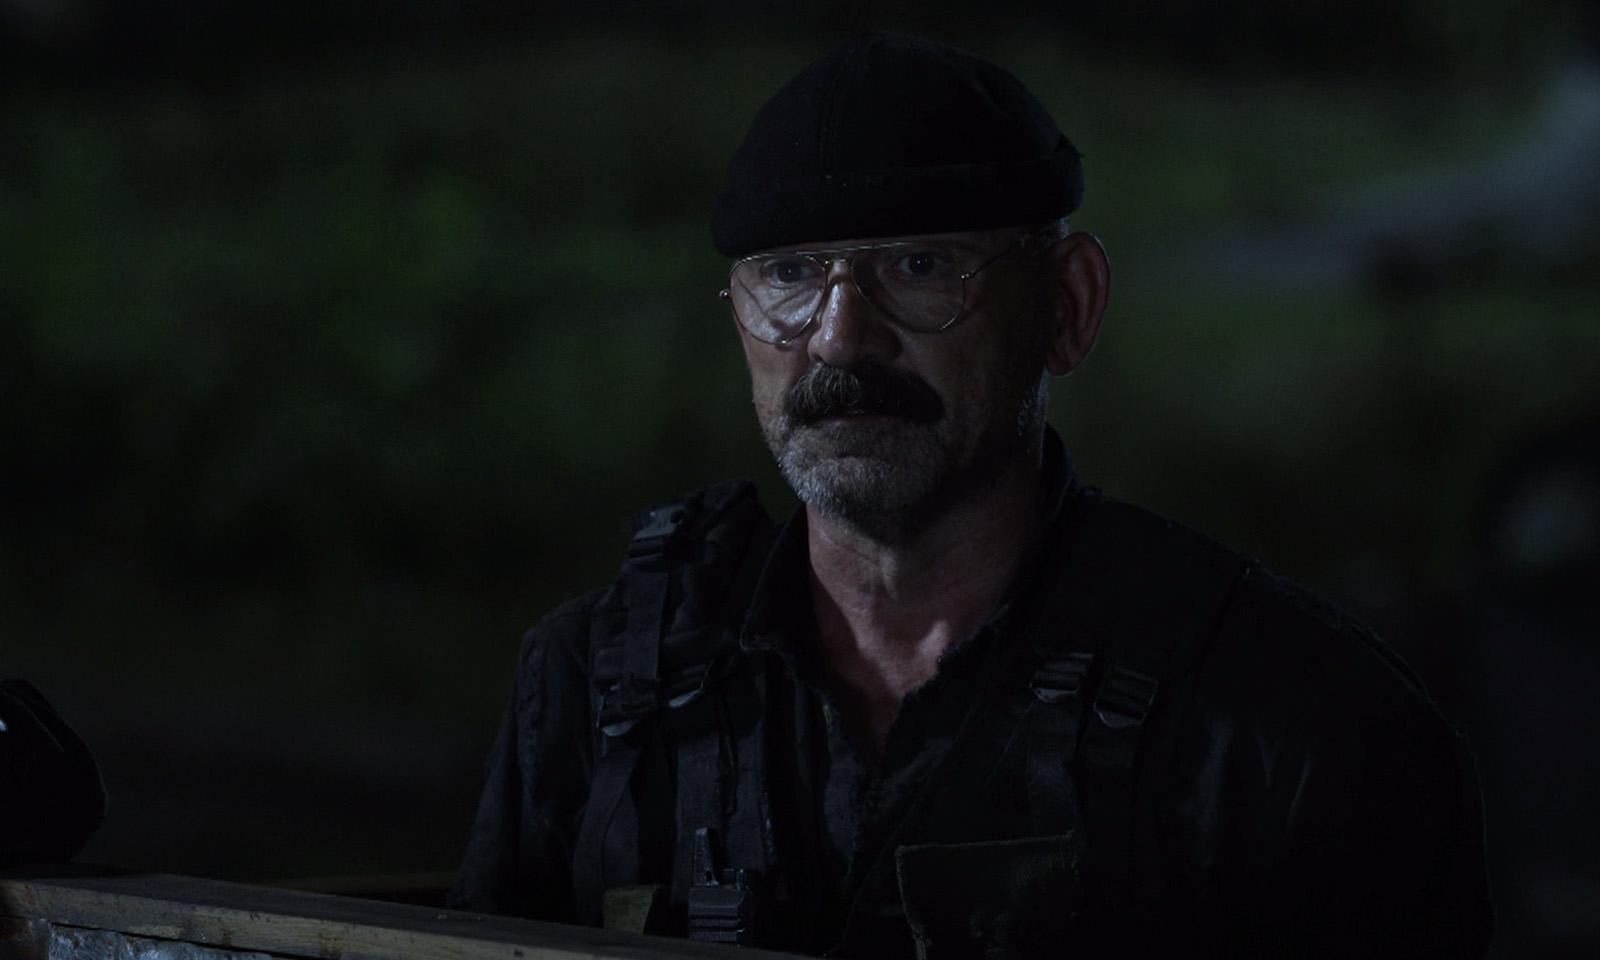 Pope observando a horda de zumbis no muro de Meridian no episódio 8 da 11ª temporada de The Walking Dead.